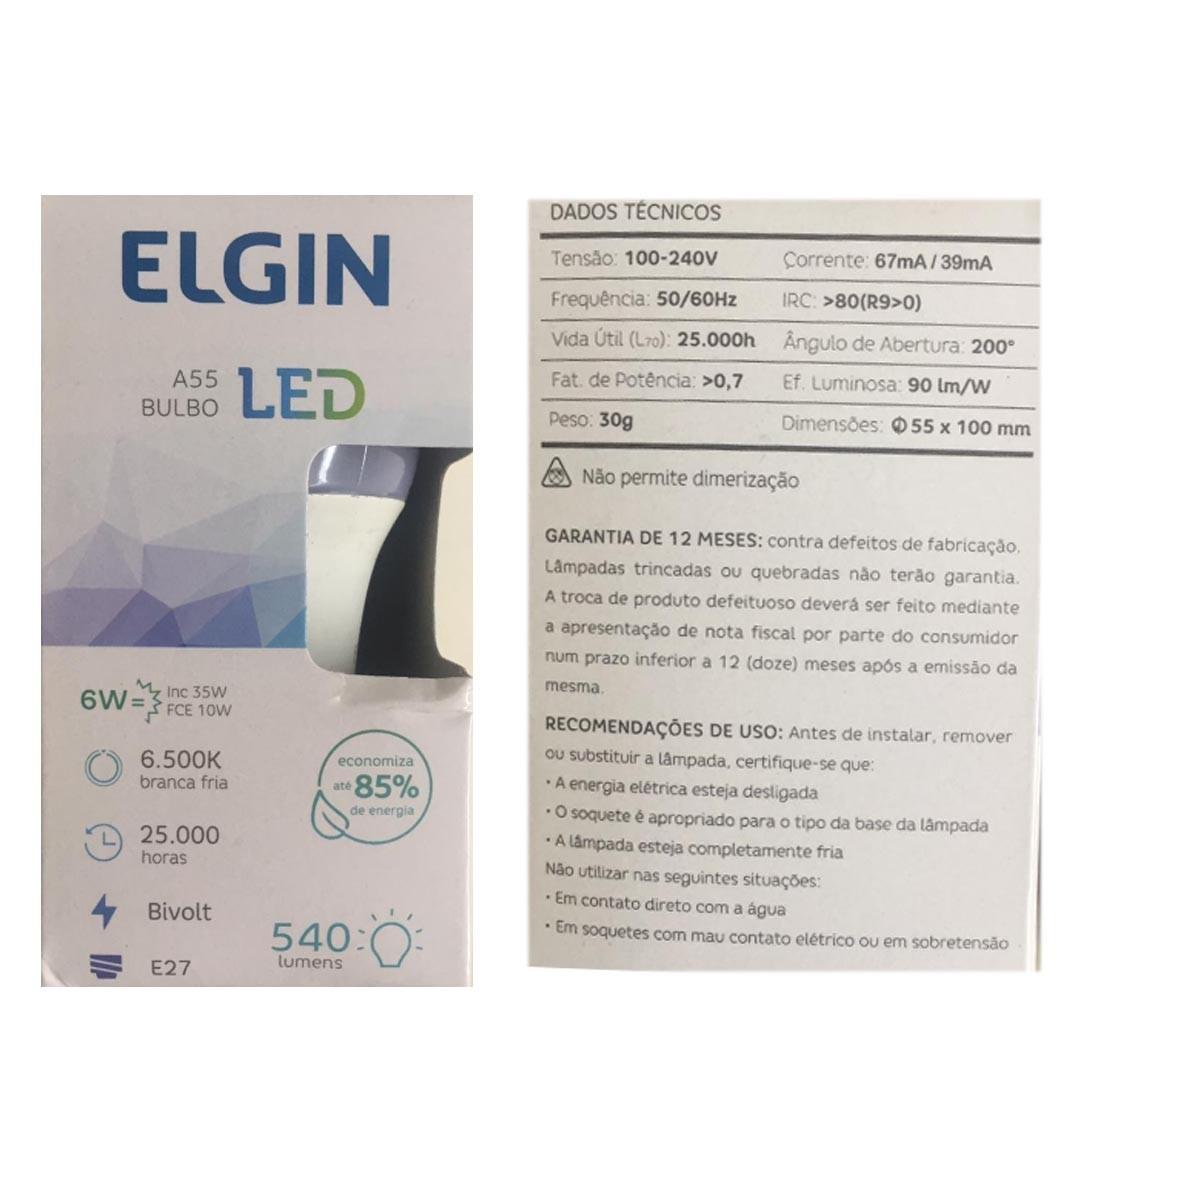 Lâmpada Elgin Led Bulbo A55 6w E27 6500K Bivolt